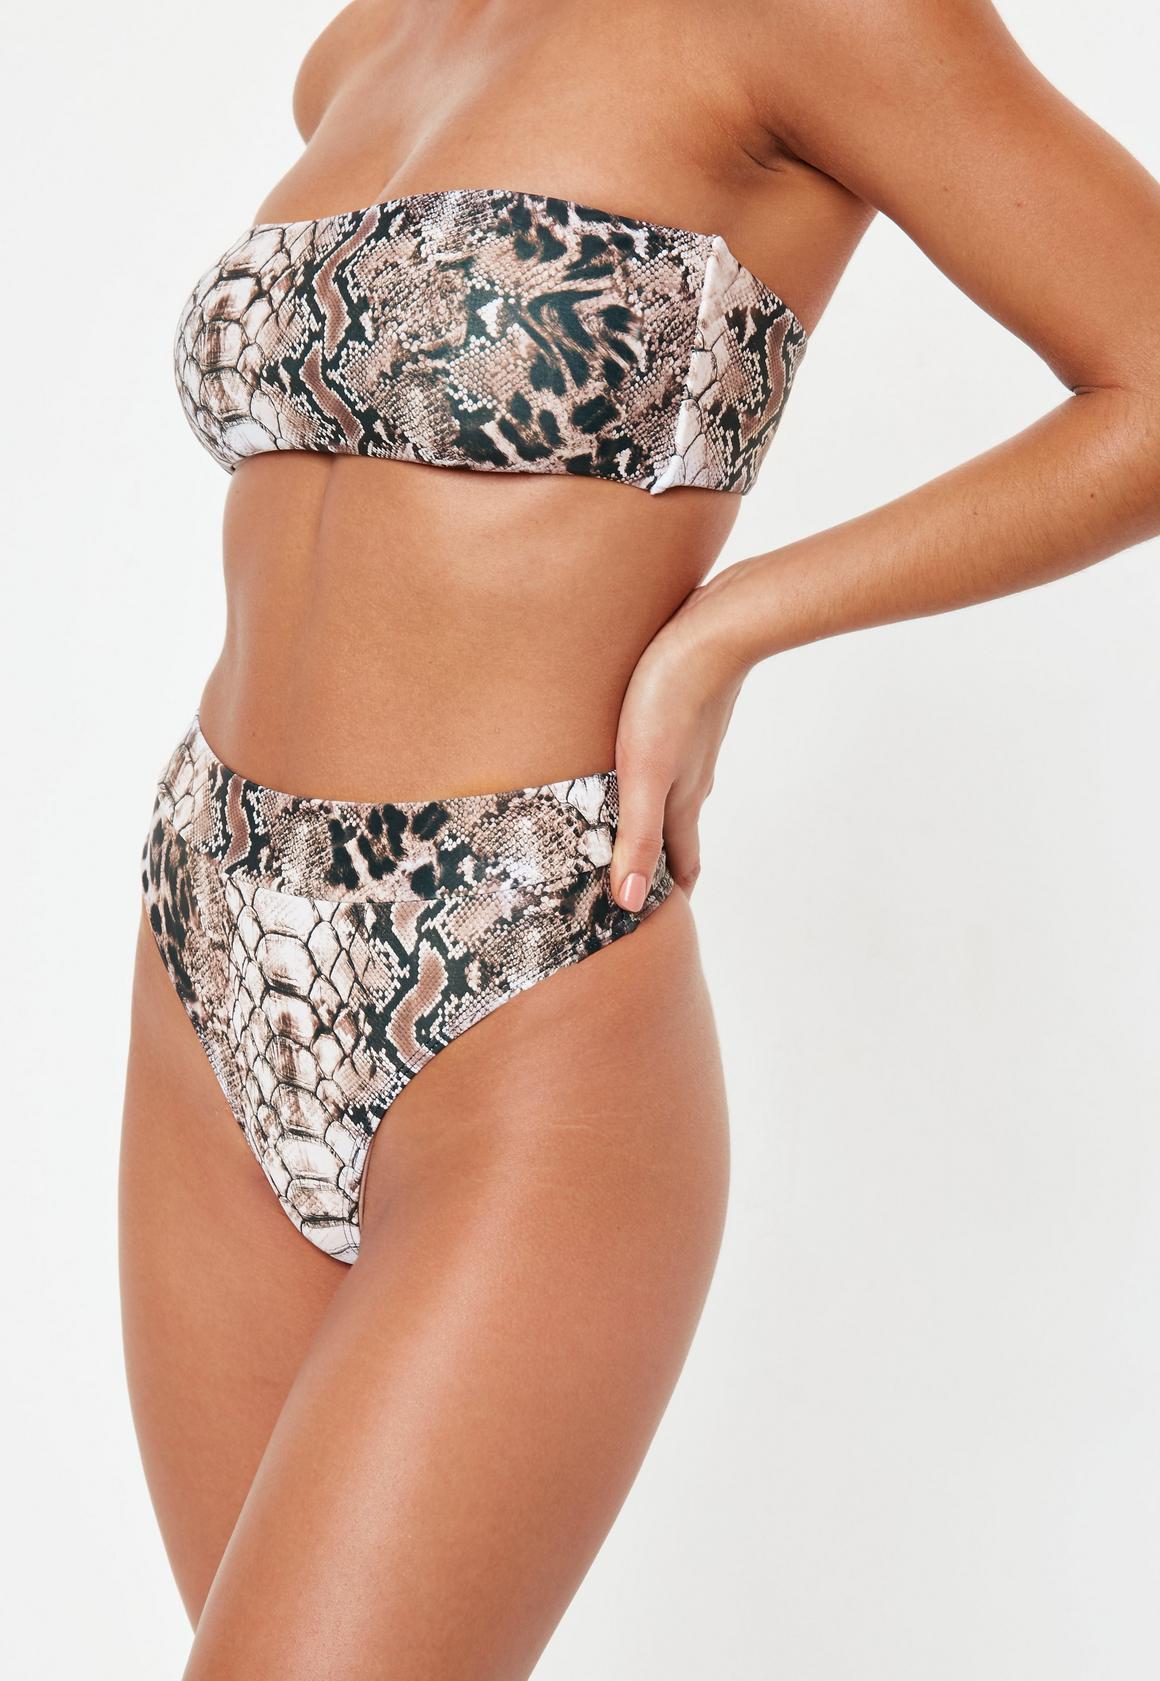 d4fb69f2db84 Bas de bikini string taille haute marron serpent